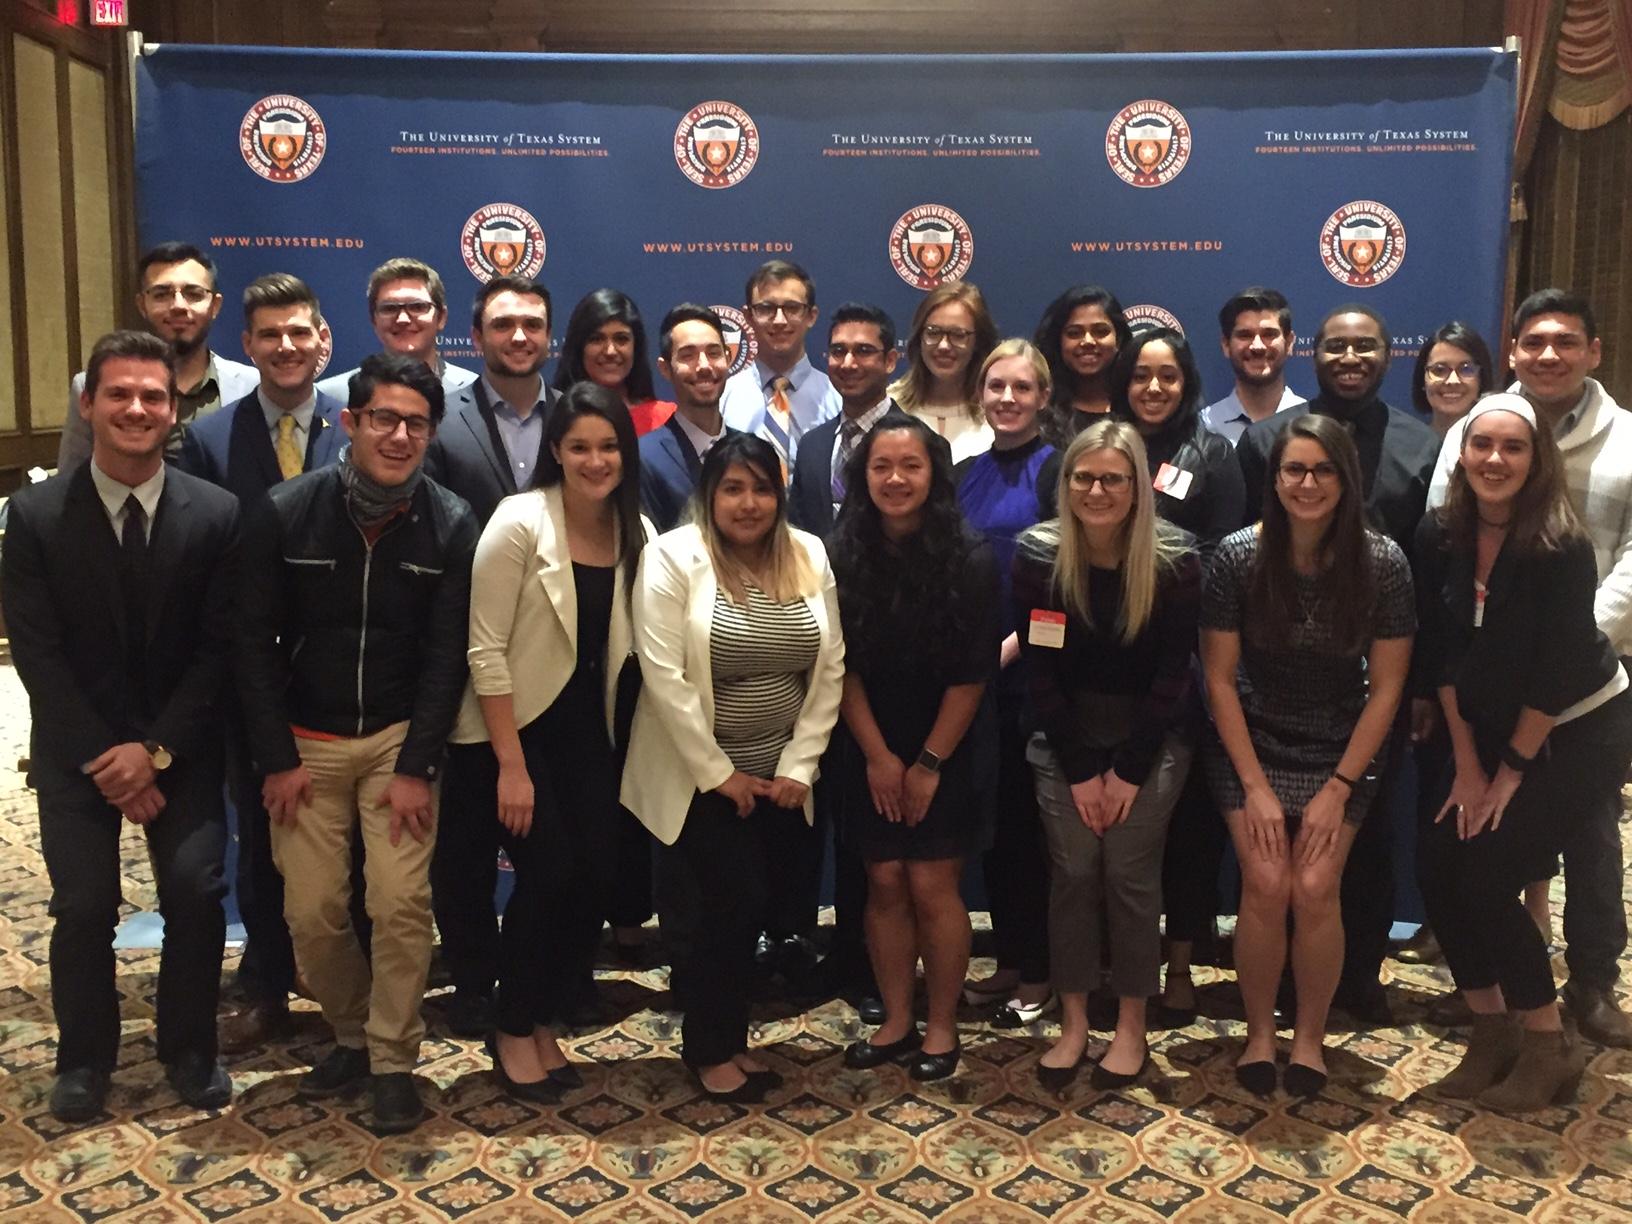 University Of Texas System Austin Texas - Group photo